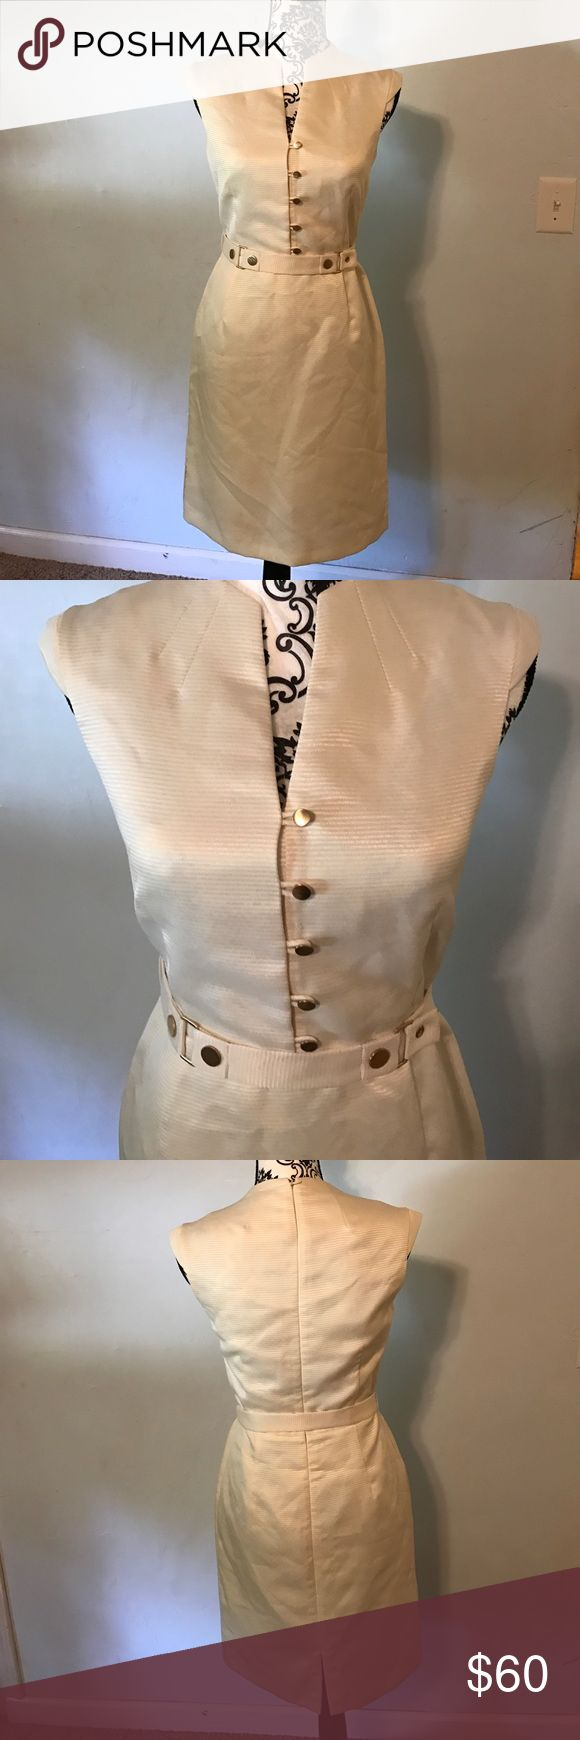 Antonio Melani cream colored dress Bust 34. Length 37 inches from shoulder. Self belt. Back zip. Dress 100% polyester ANTONIO MELANI Dresses